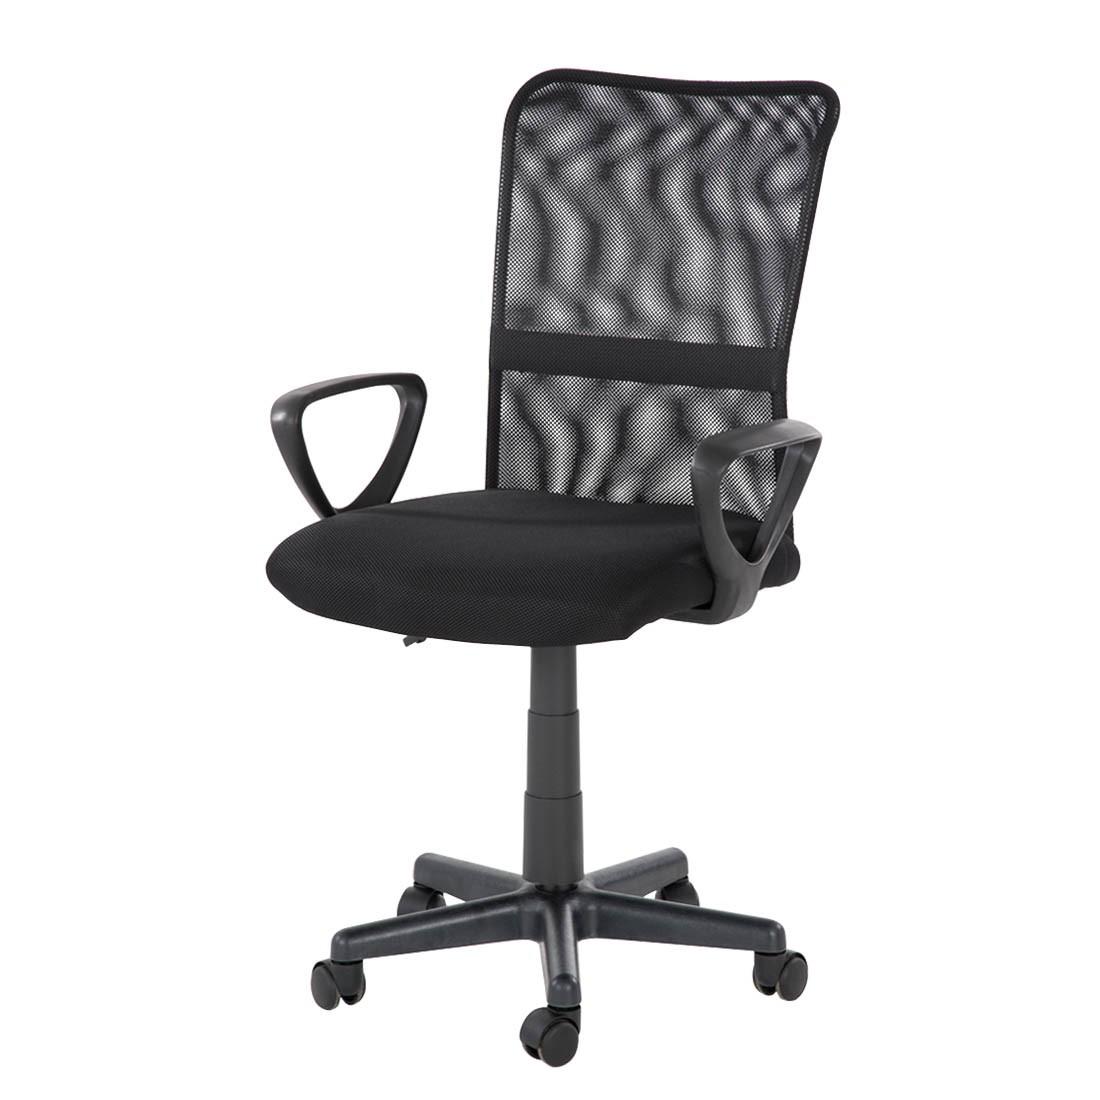 Bürodrehstuhl Jason – Textilbezug – Schwarz, home24office günstig bestellen